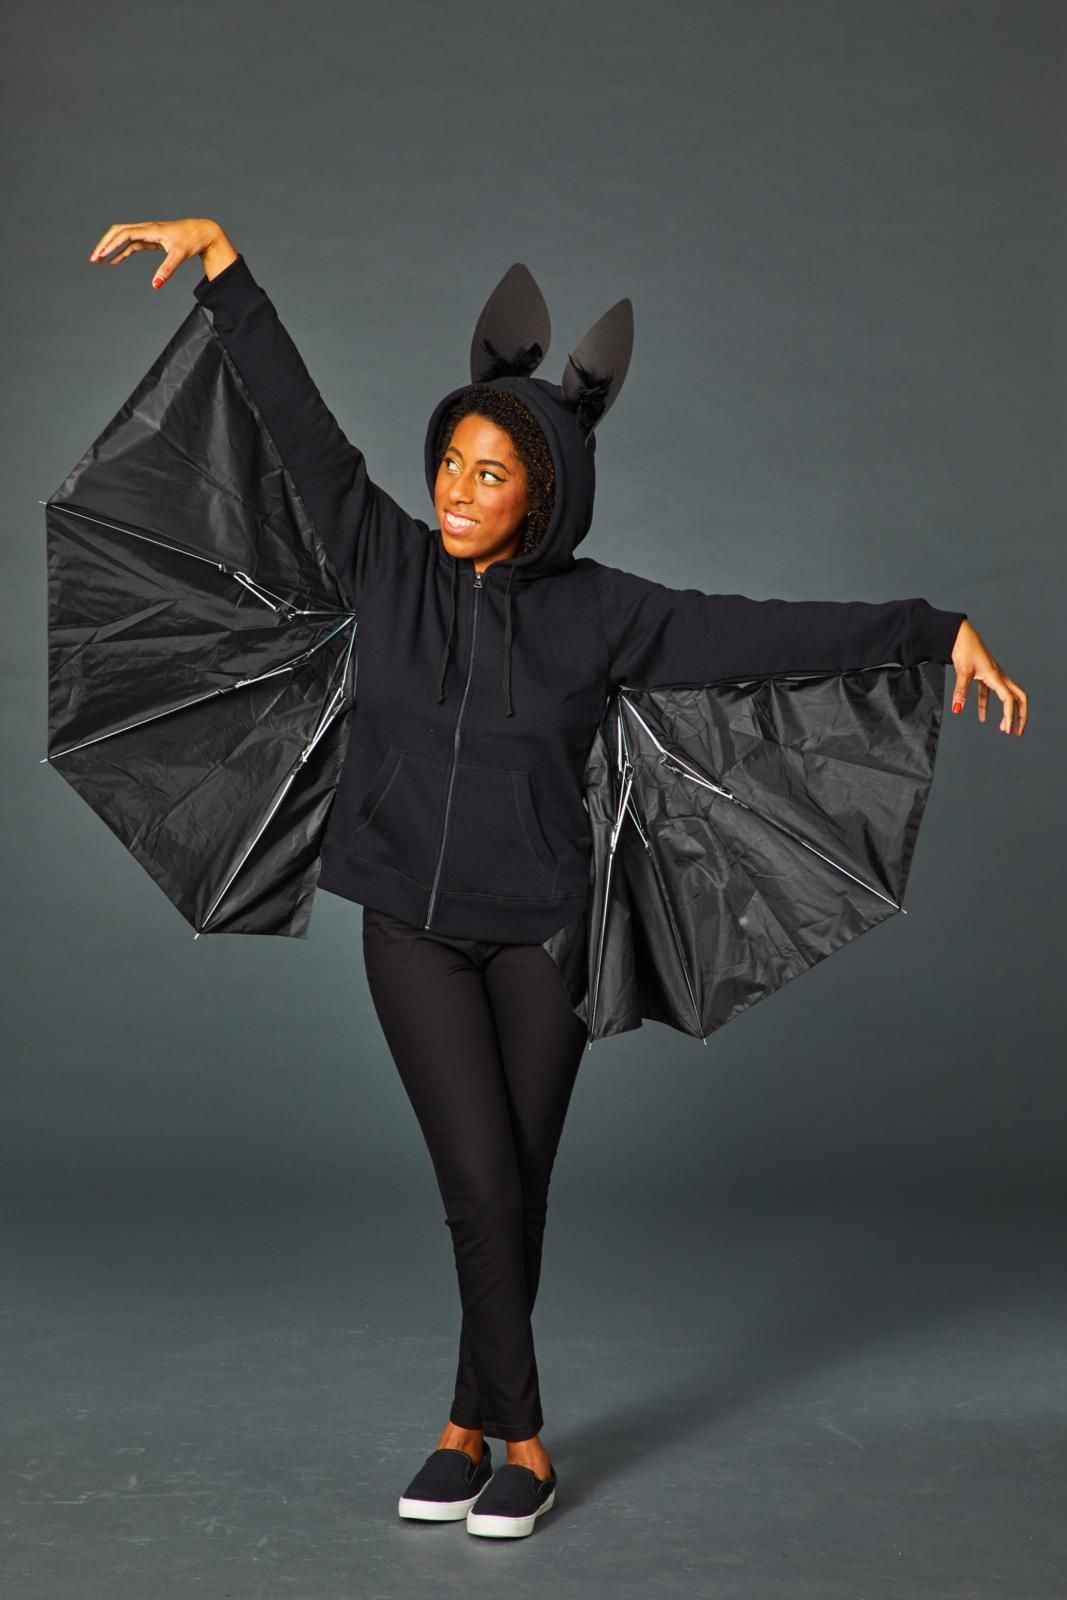 Funny Halloween Costumes Closet 2020 65 Easy Last Minute Halloween Costume Ideas 2020   DIY Halloween